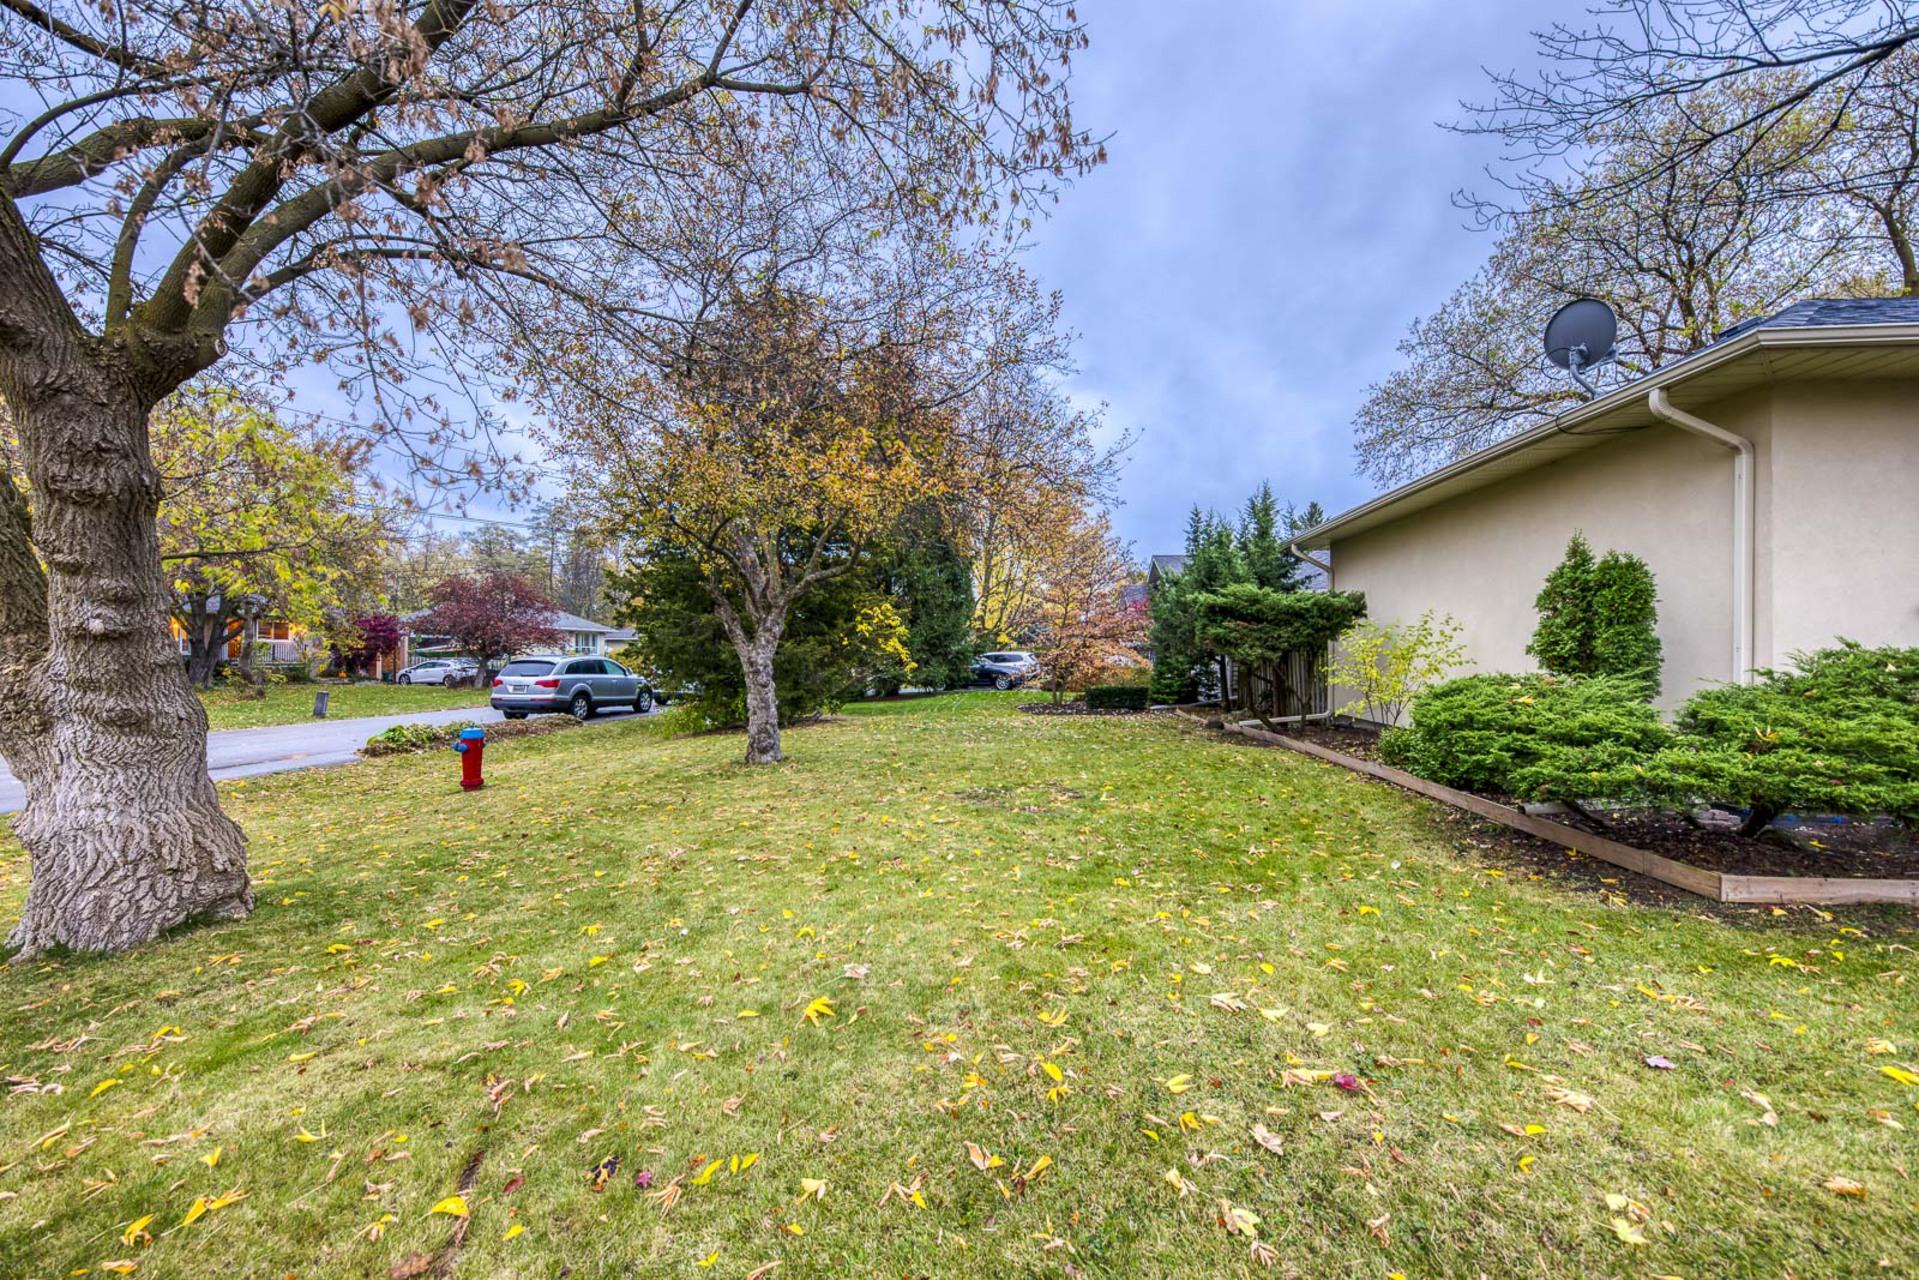 Backyard - 2058 Constance Dr, Oakville - Elite3 & Team at 2058 Constance Drive, Eastlake, Oakville